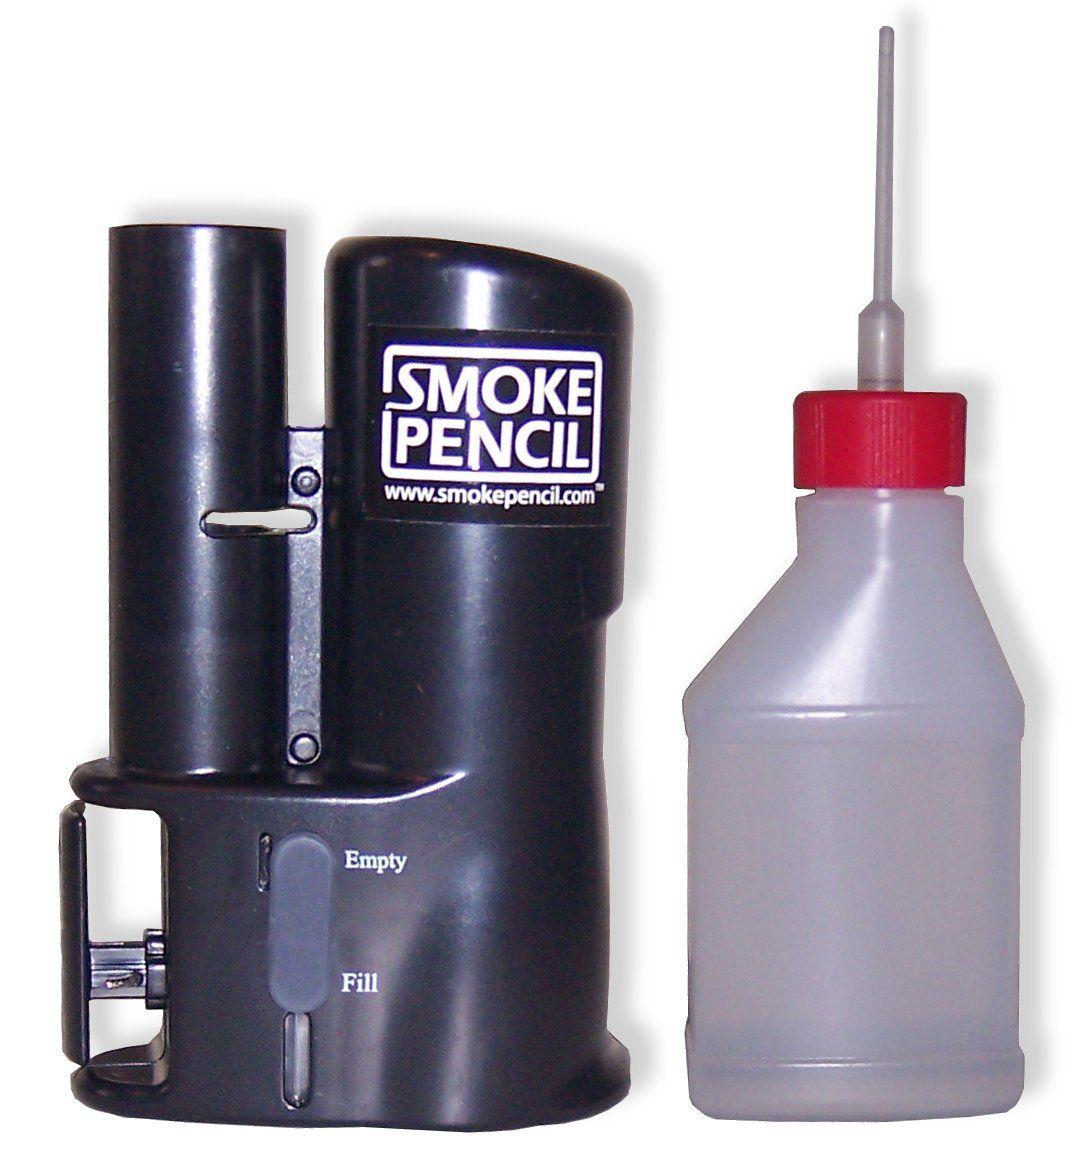 Smoke Pencil Pro Draft Detector Puffer 41, Amazon Prime